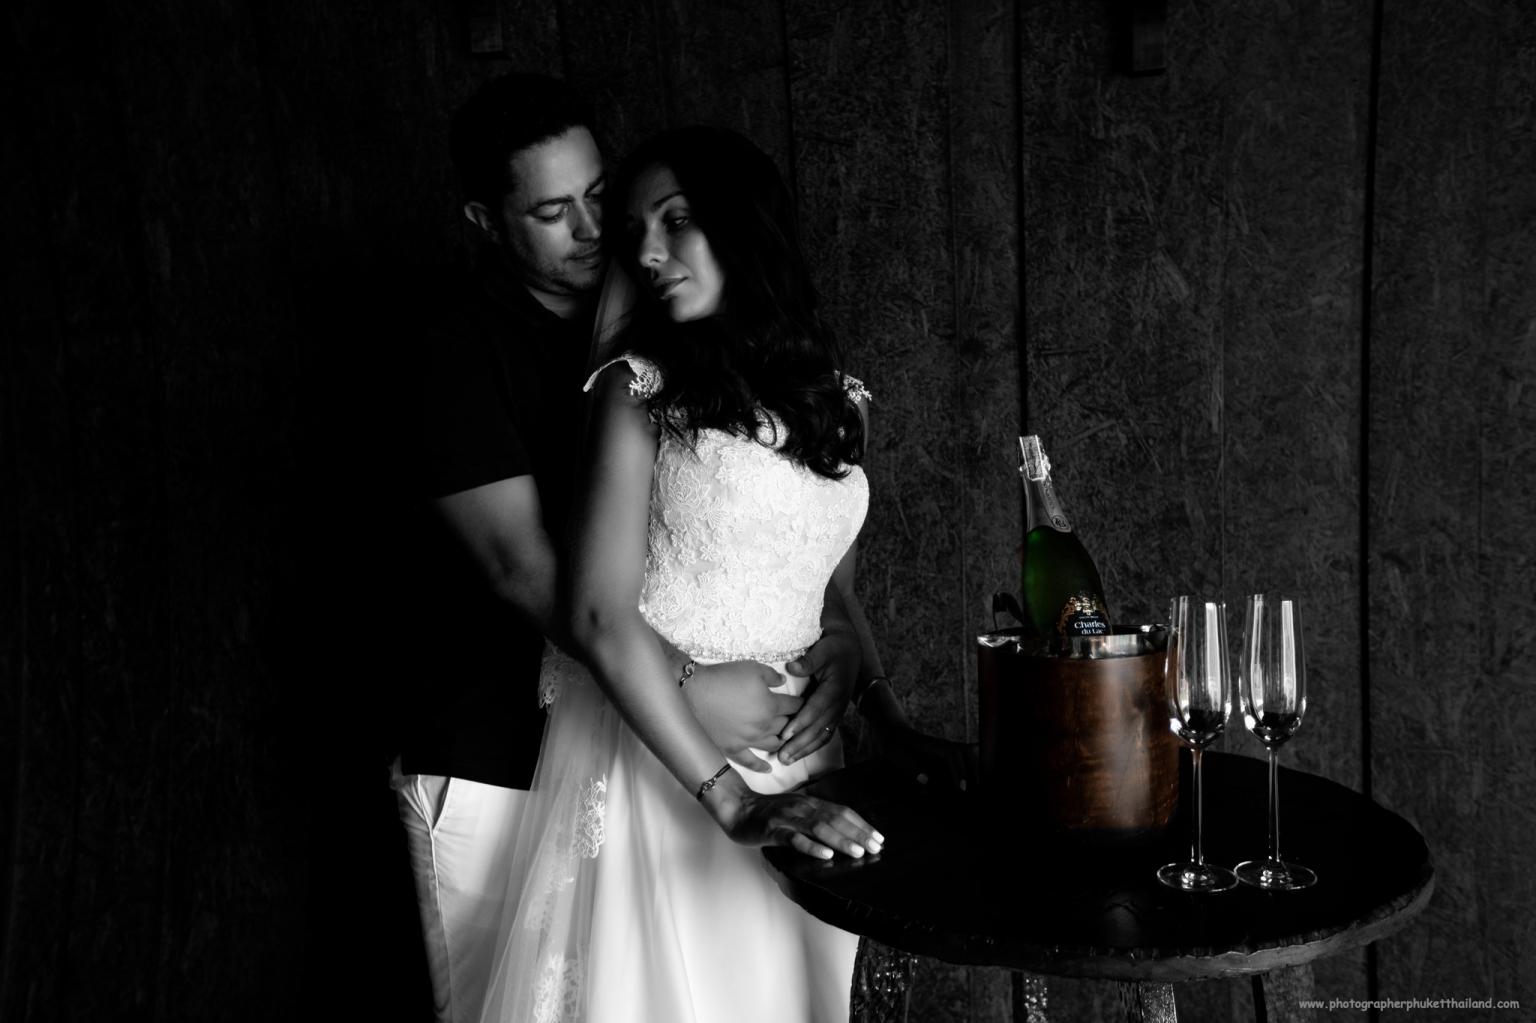 Post wedding photoshoot by phuket wedding photographer